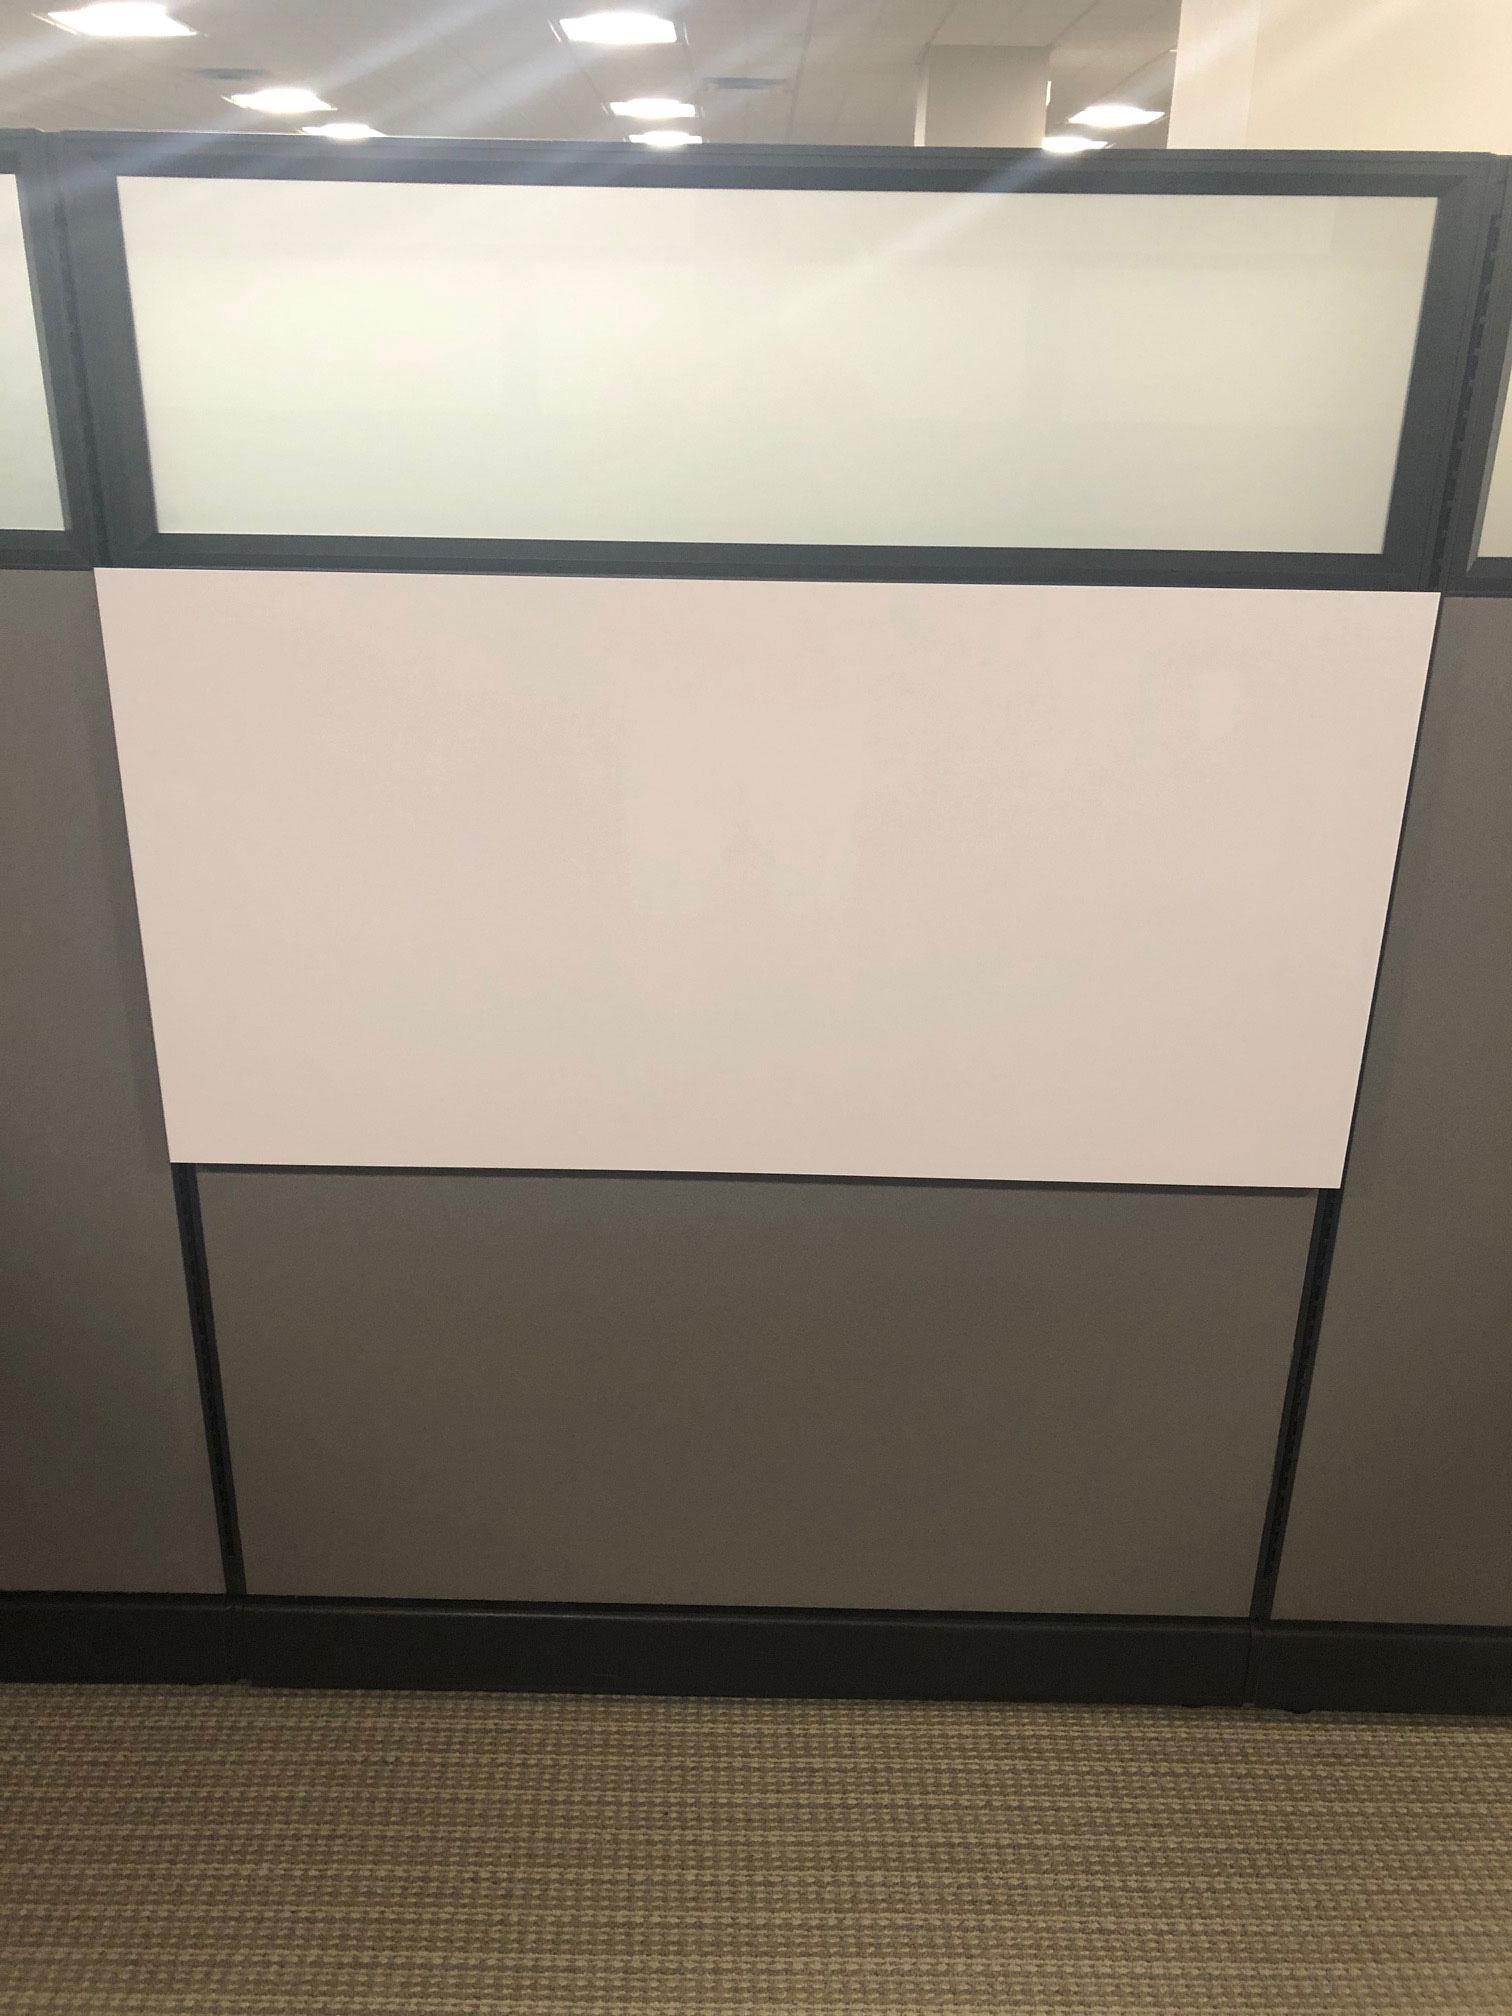 office-cubicles-for-sale-in-altamonte-springs-florida-2.jpg